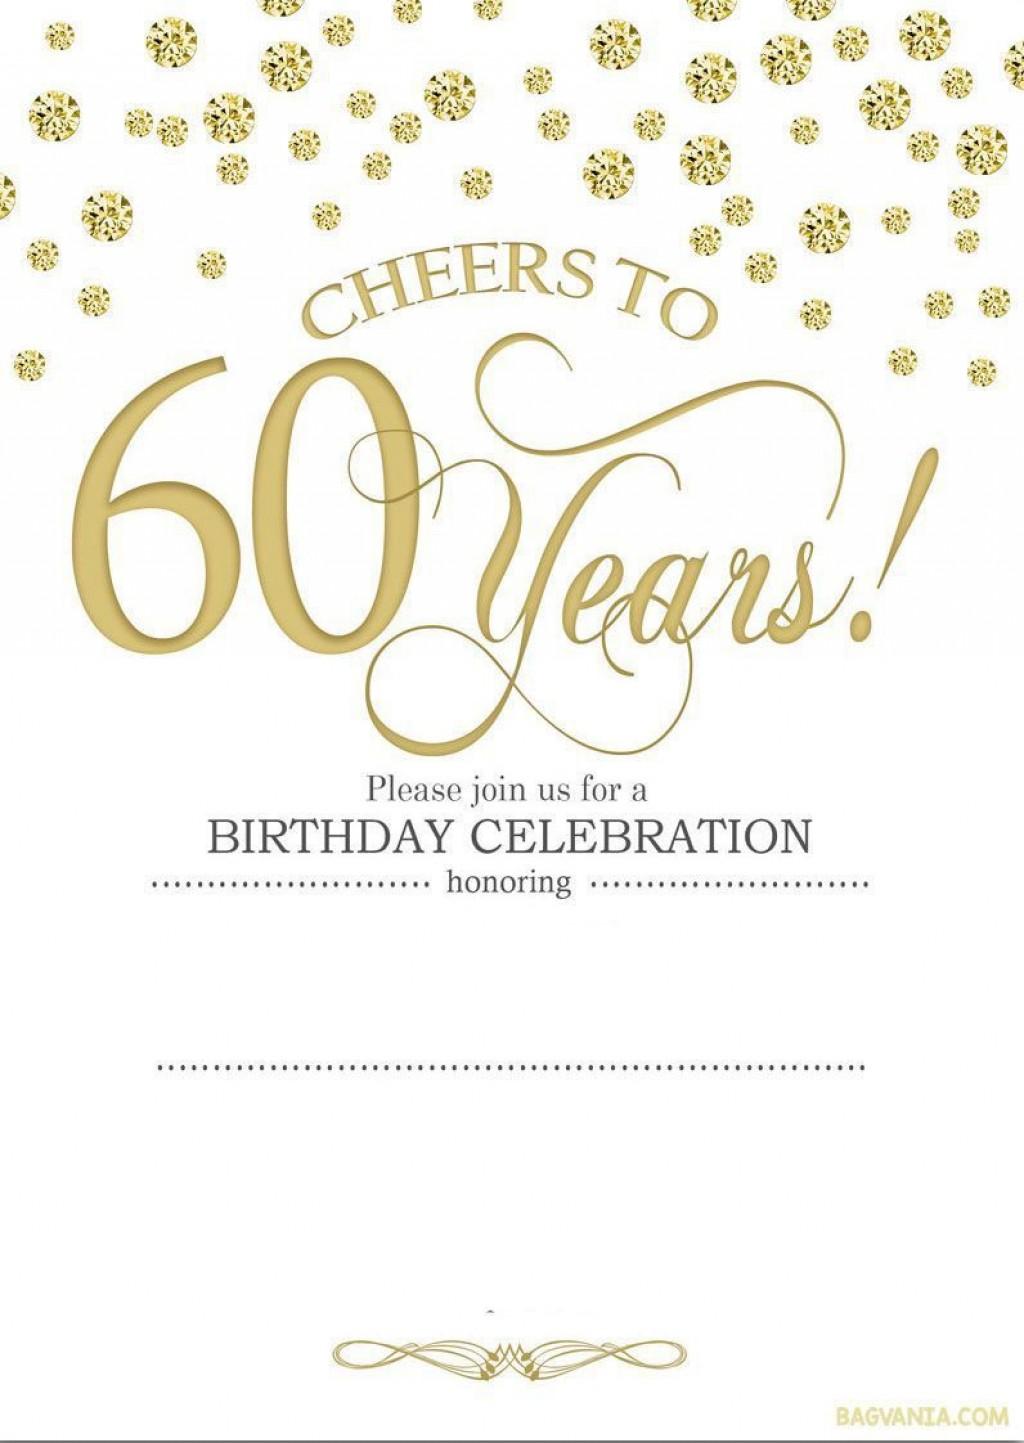 001 Stunning 60 Birthday Invite Template High Resolution  Templates 60th Printable FreeLarge